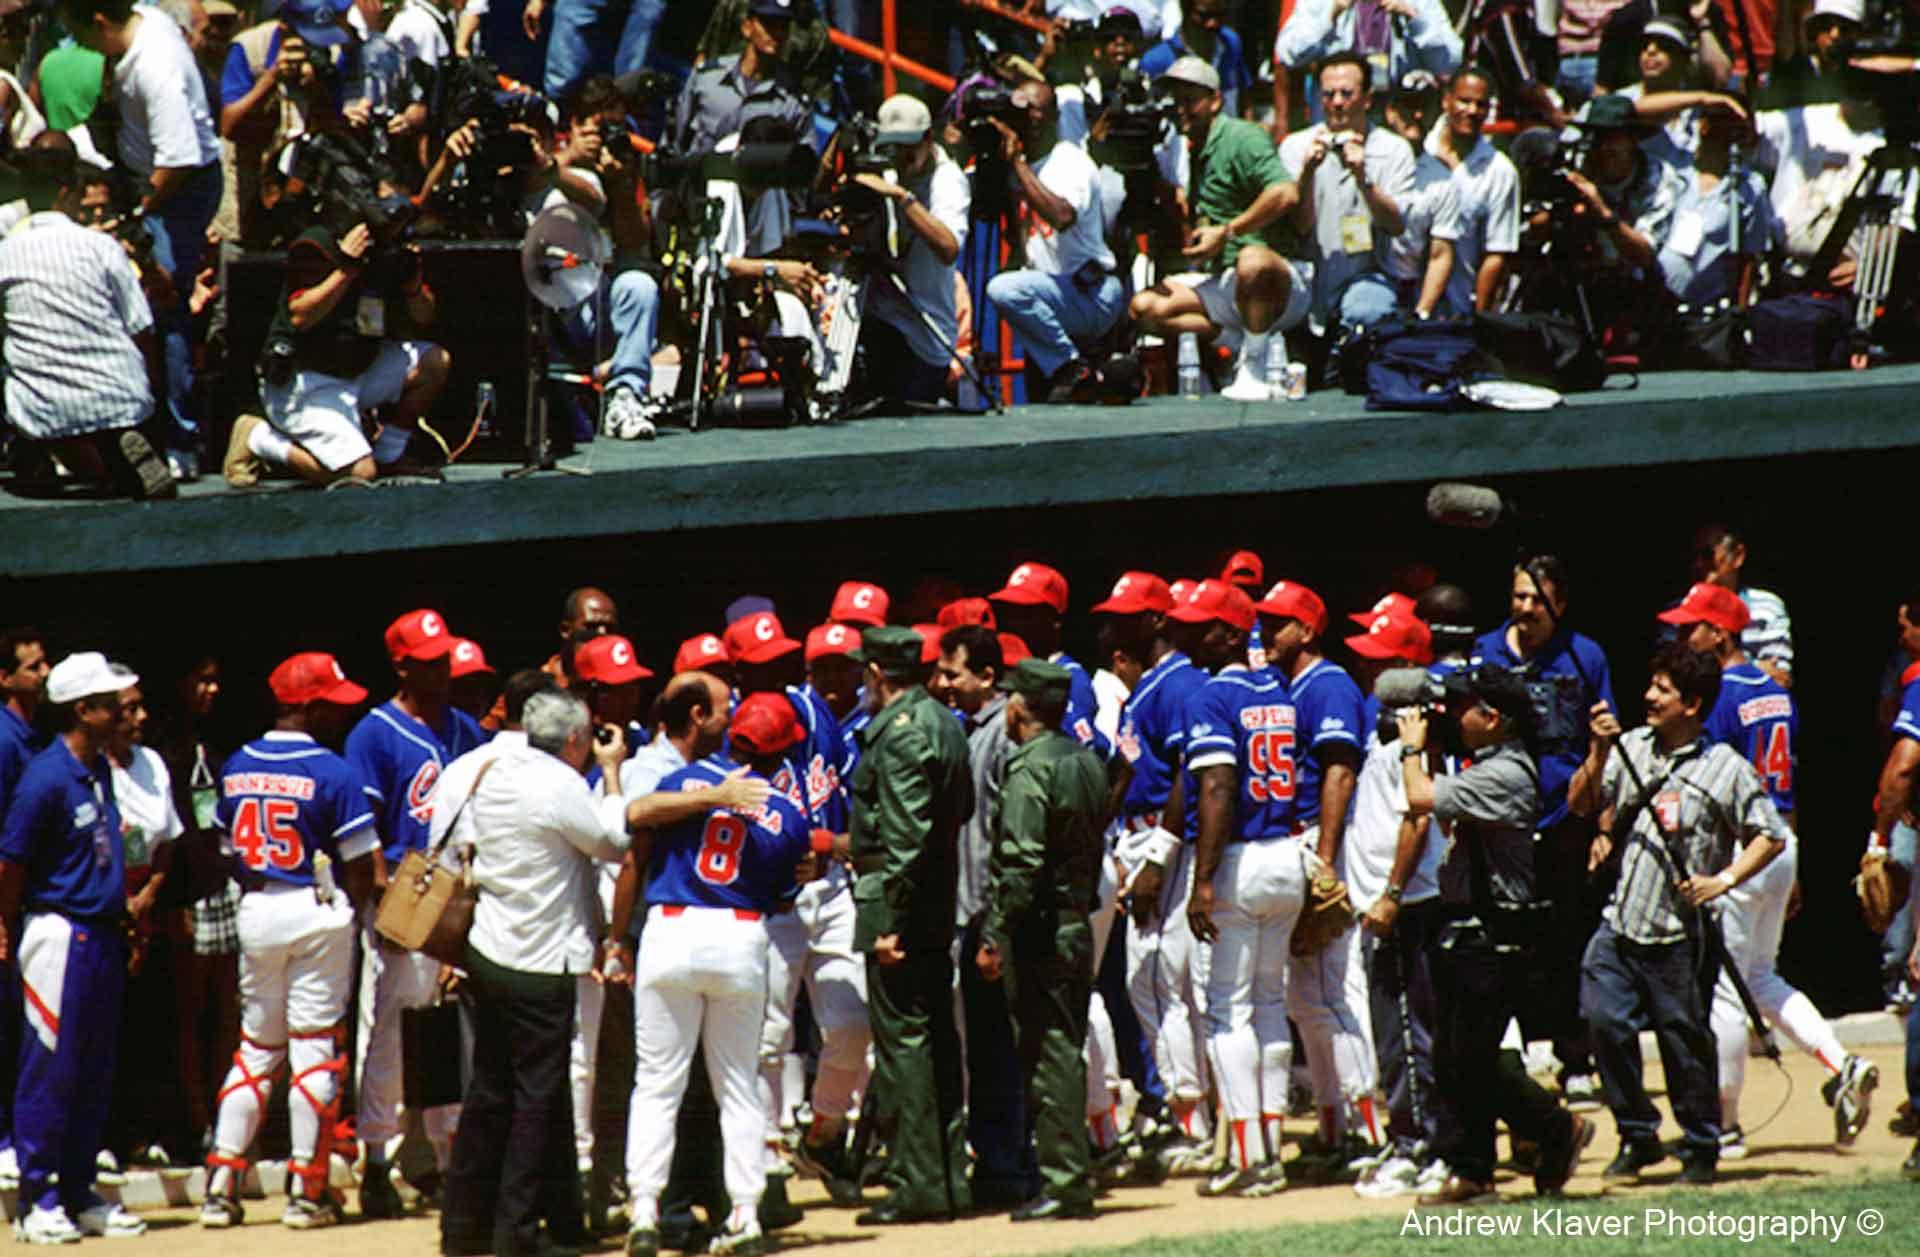 Castro meets the Cuban Baseball team, 1999